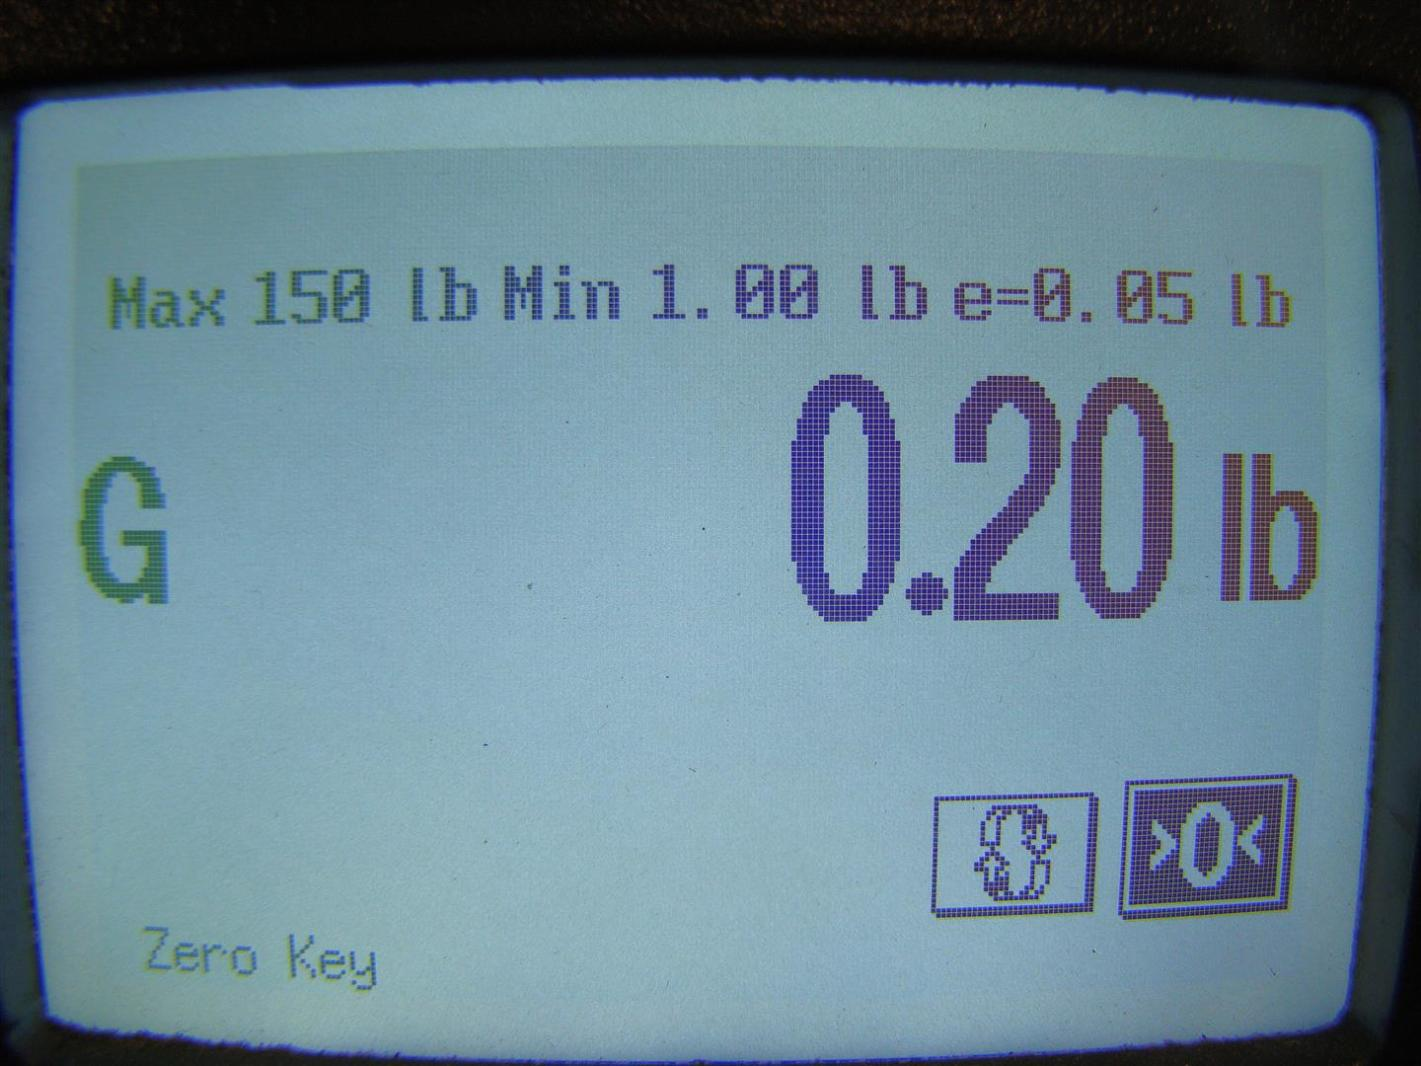 Robohand Efector Inductive Proximity Sensor Oisn 003 Joseph Fazzio Sensors